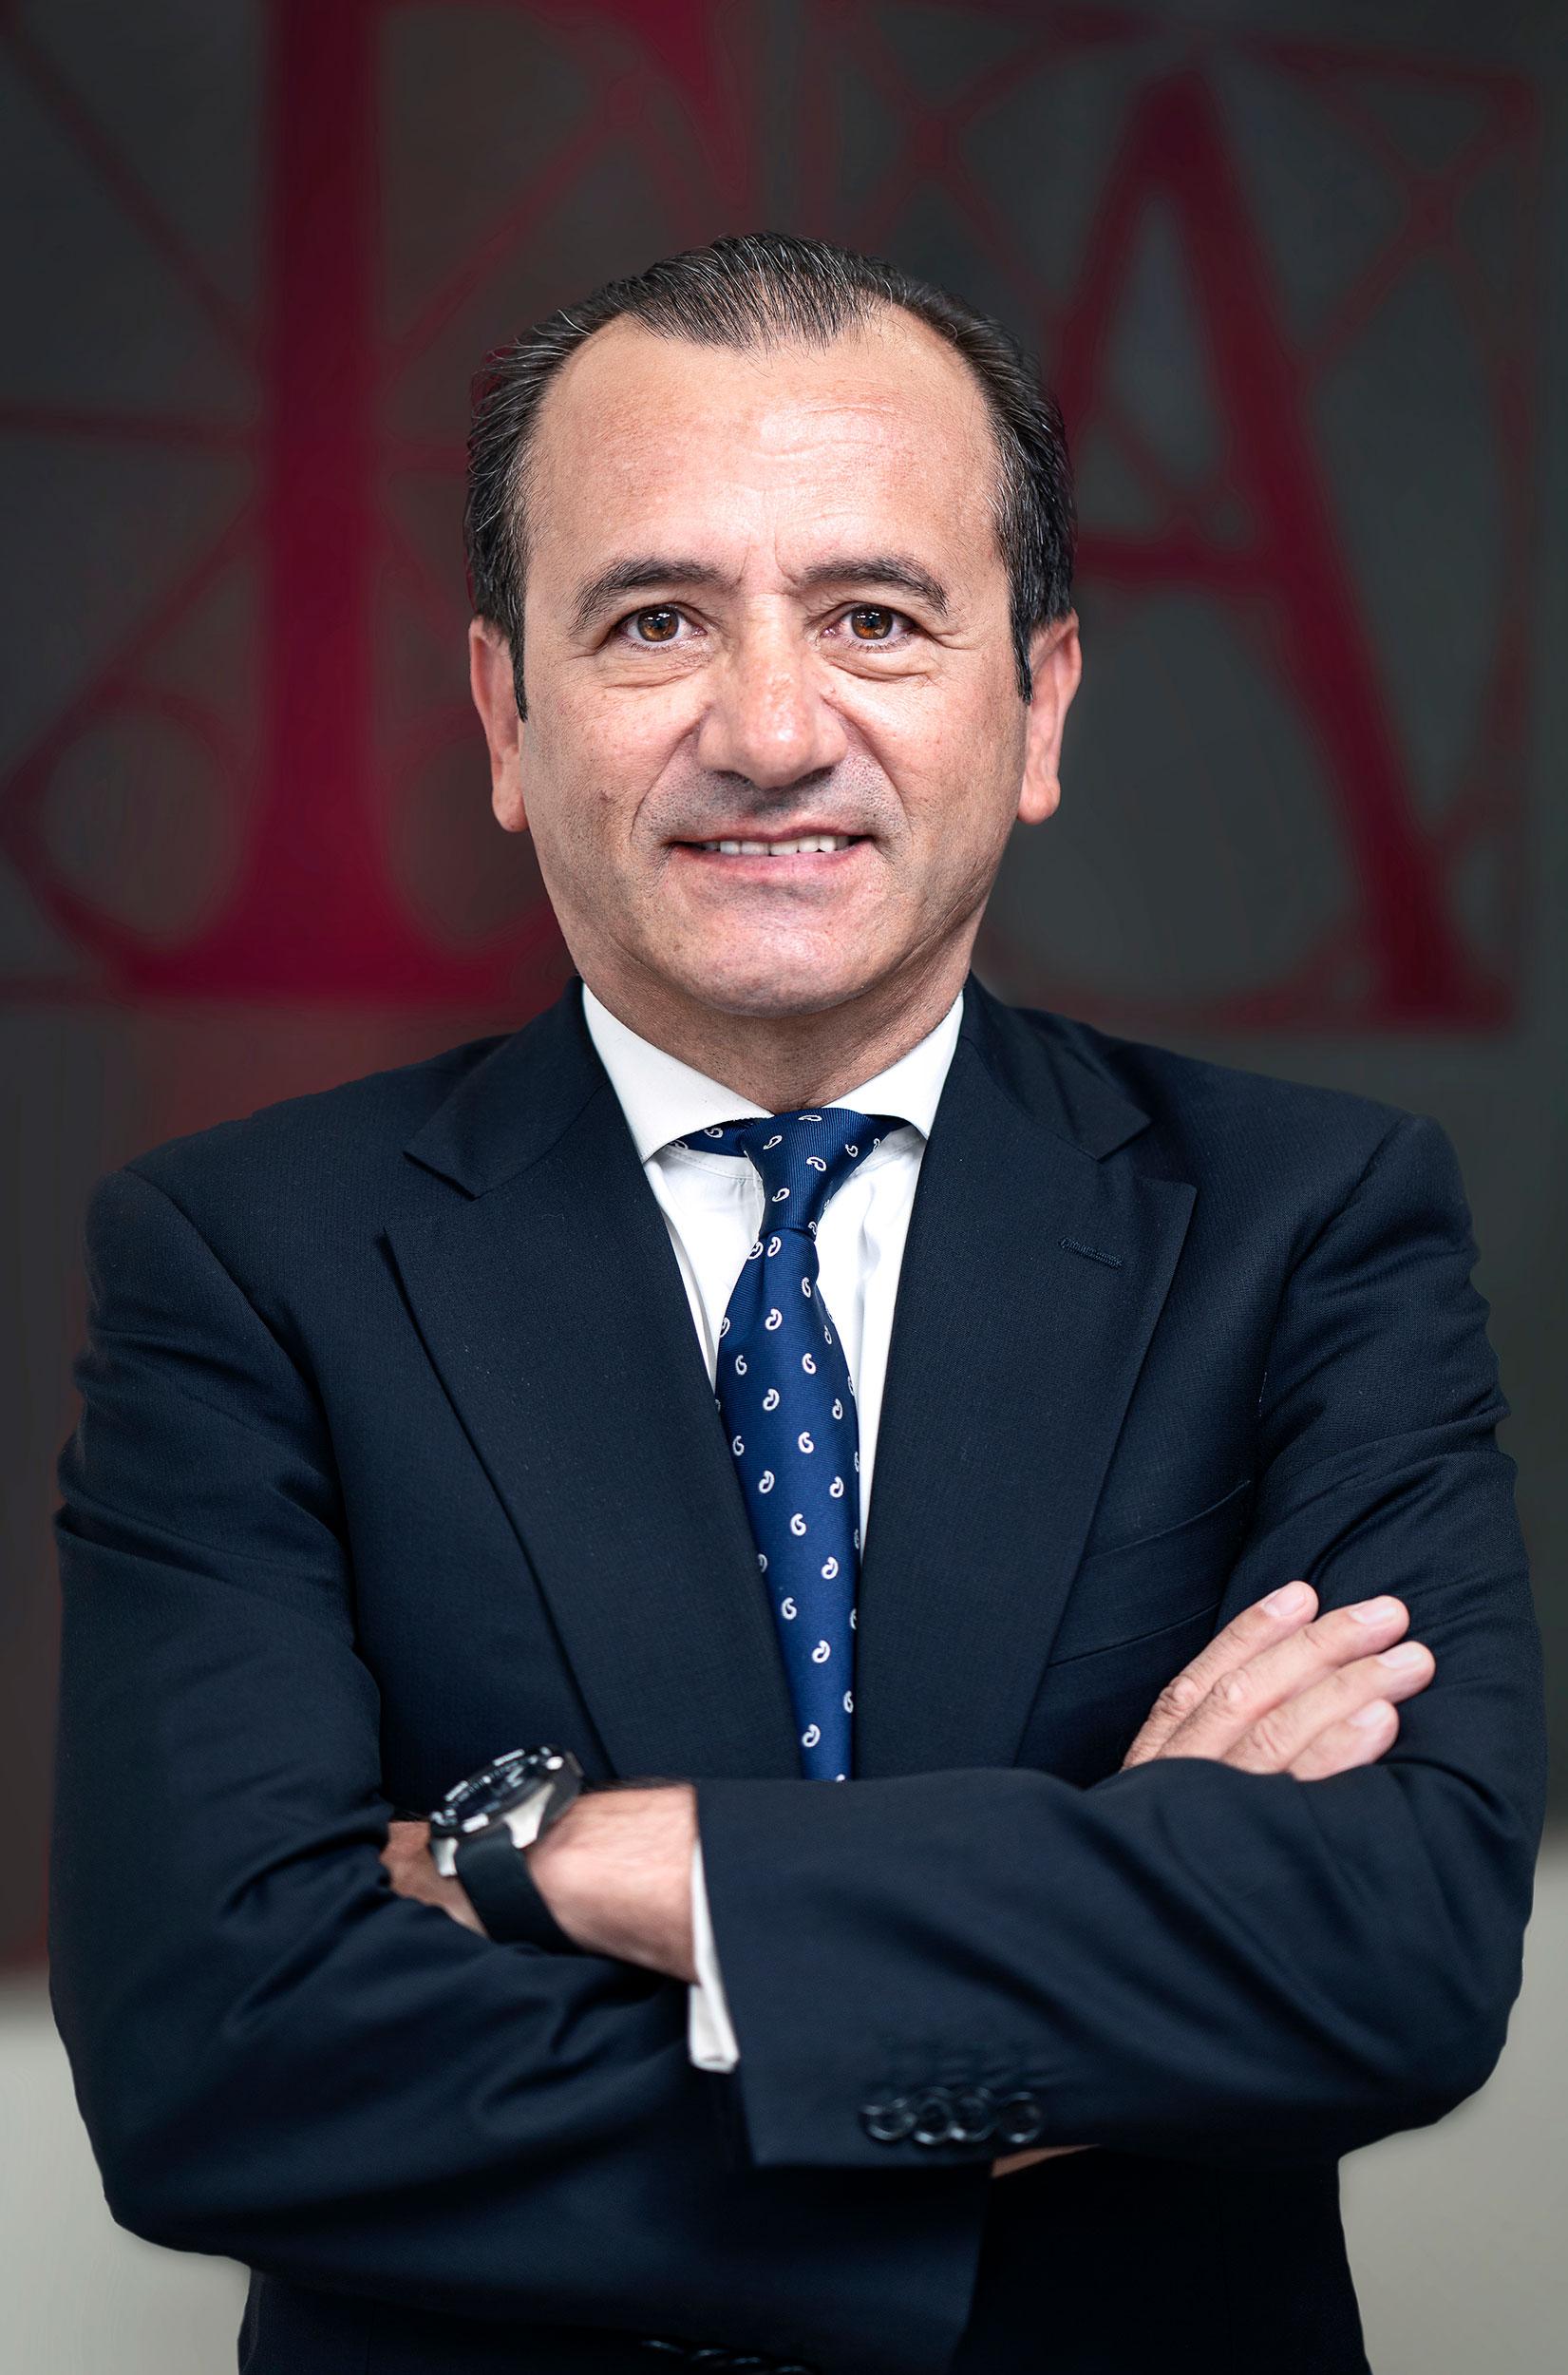 Antonio Ballester Sánchez